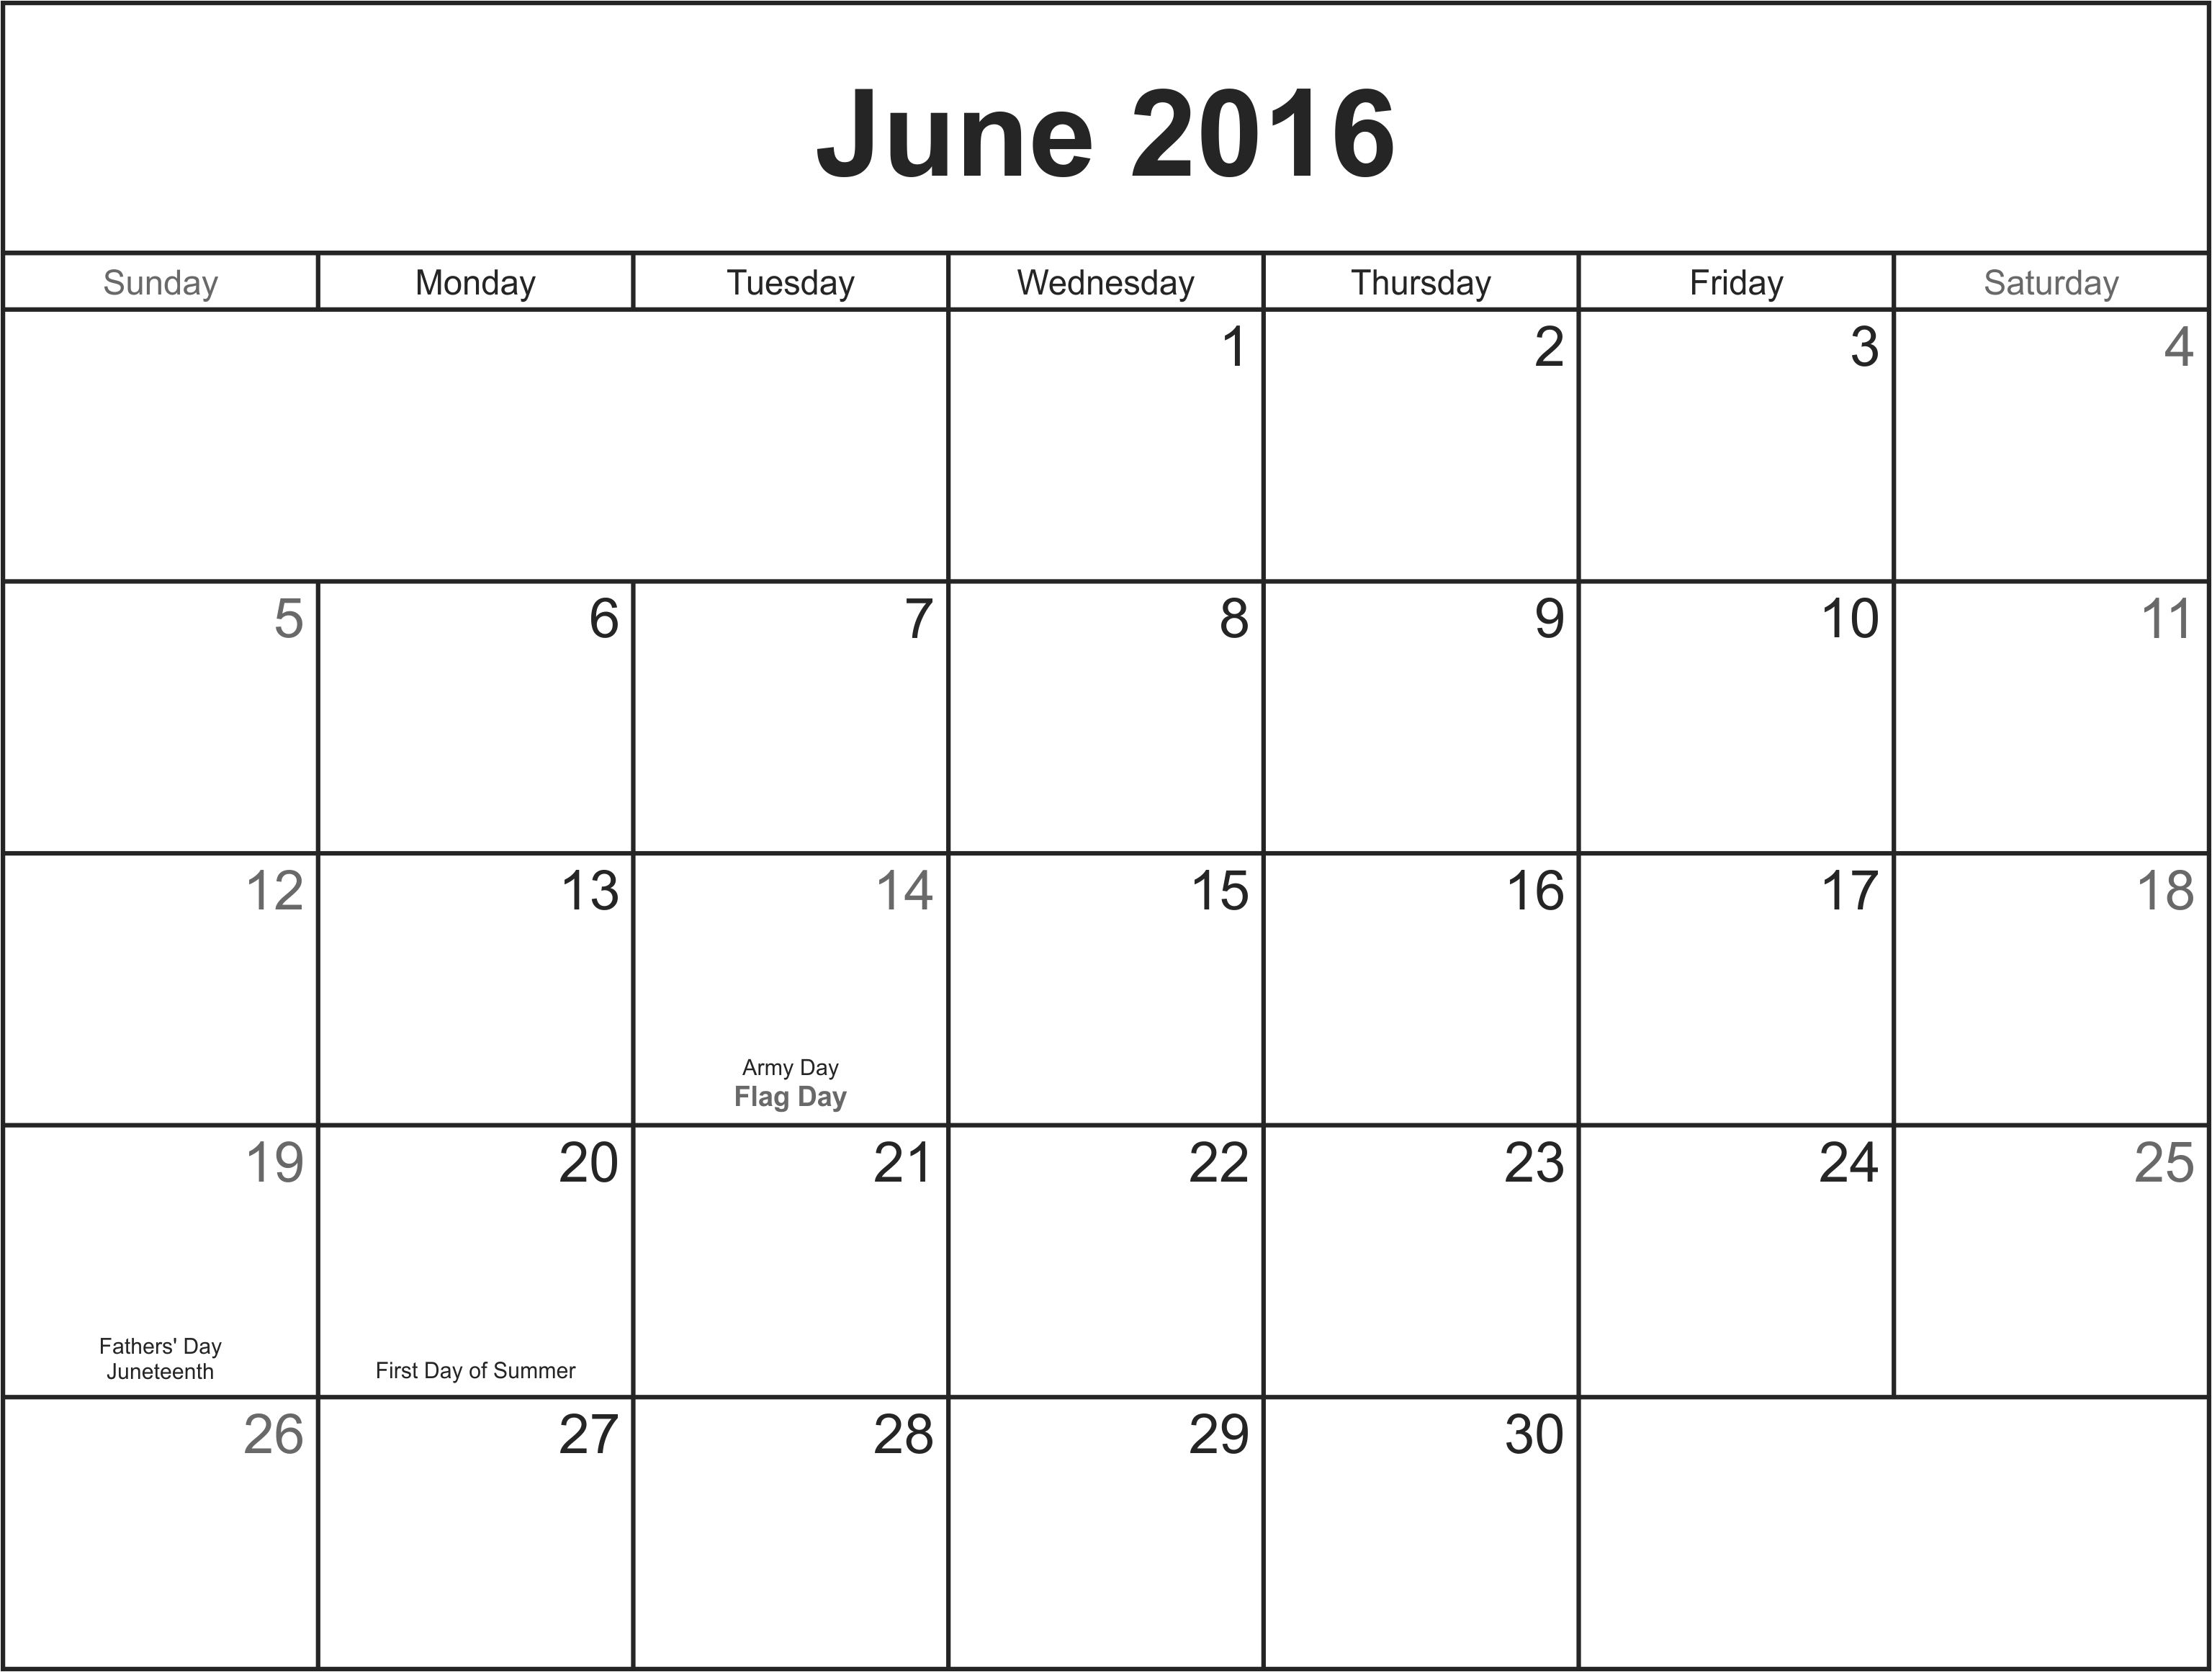 June 2016 Printable Calendar  Printable Blank Calendar with June 2016 Calendar Printable